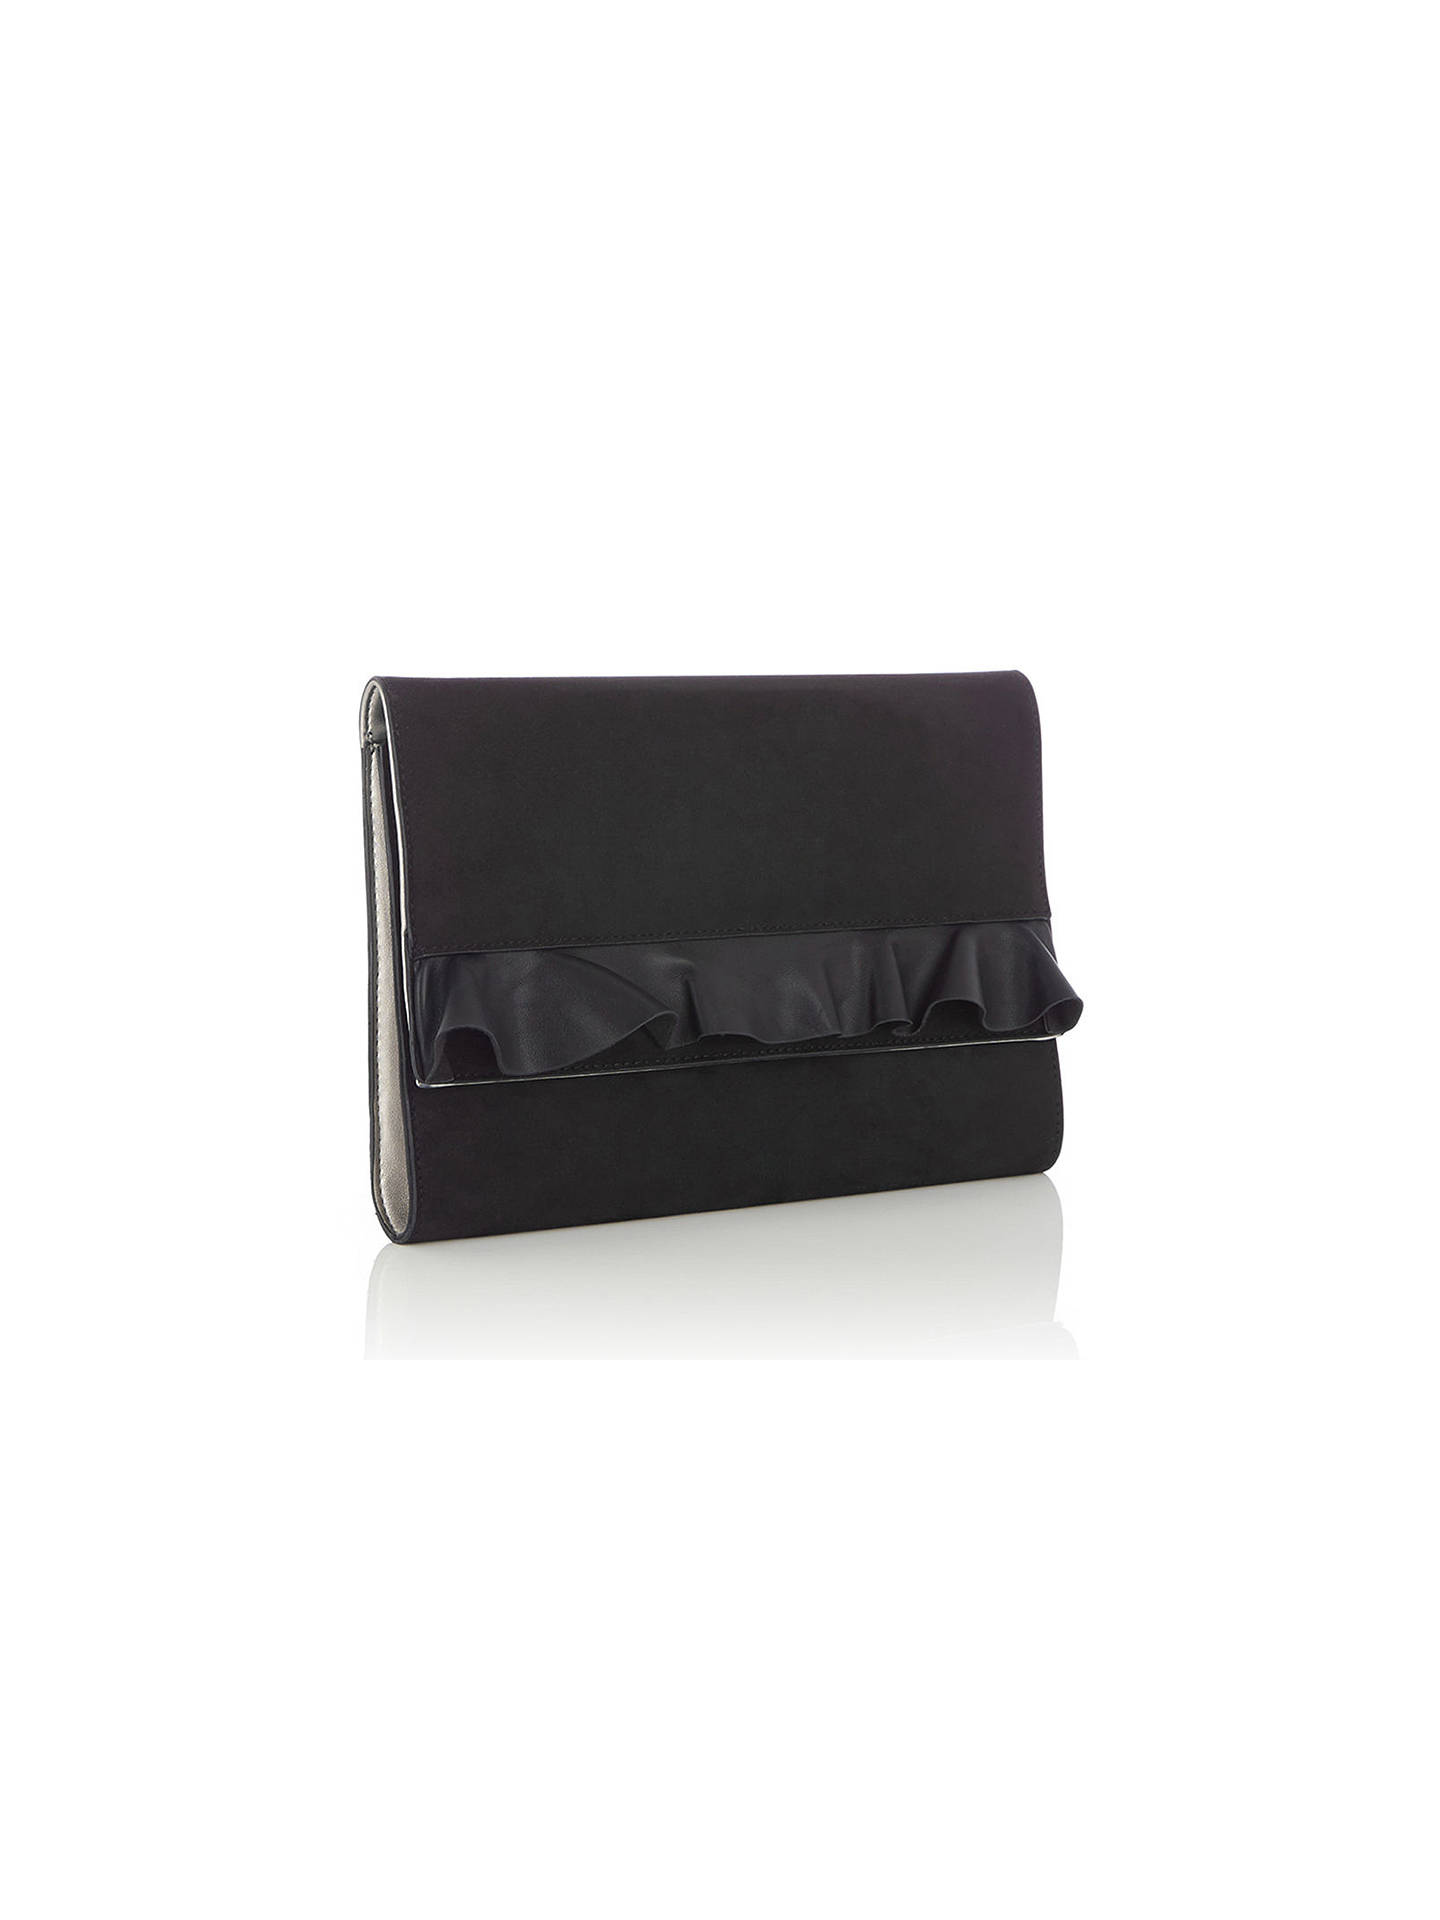 a3dbd3ddef3e Buy Oasis Ruffle Clutch Bag, Black Online at johnlewis.com ...